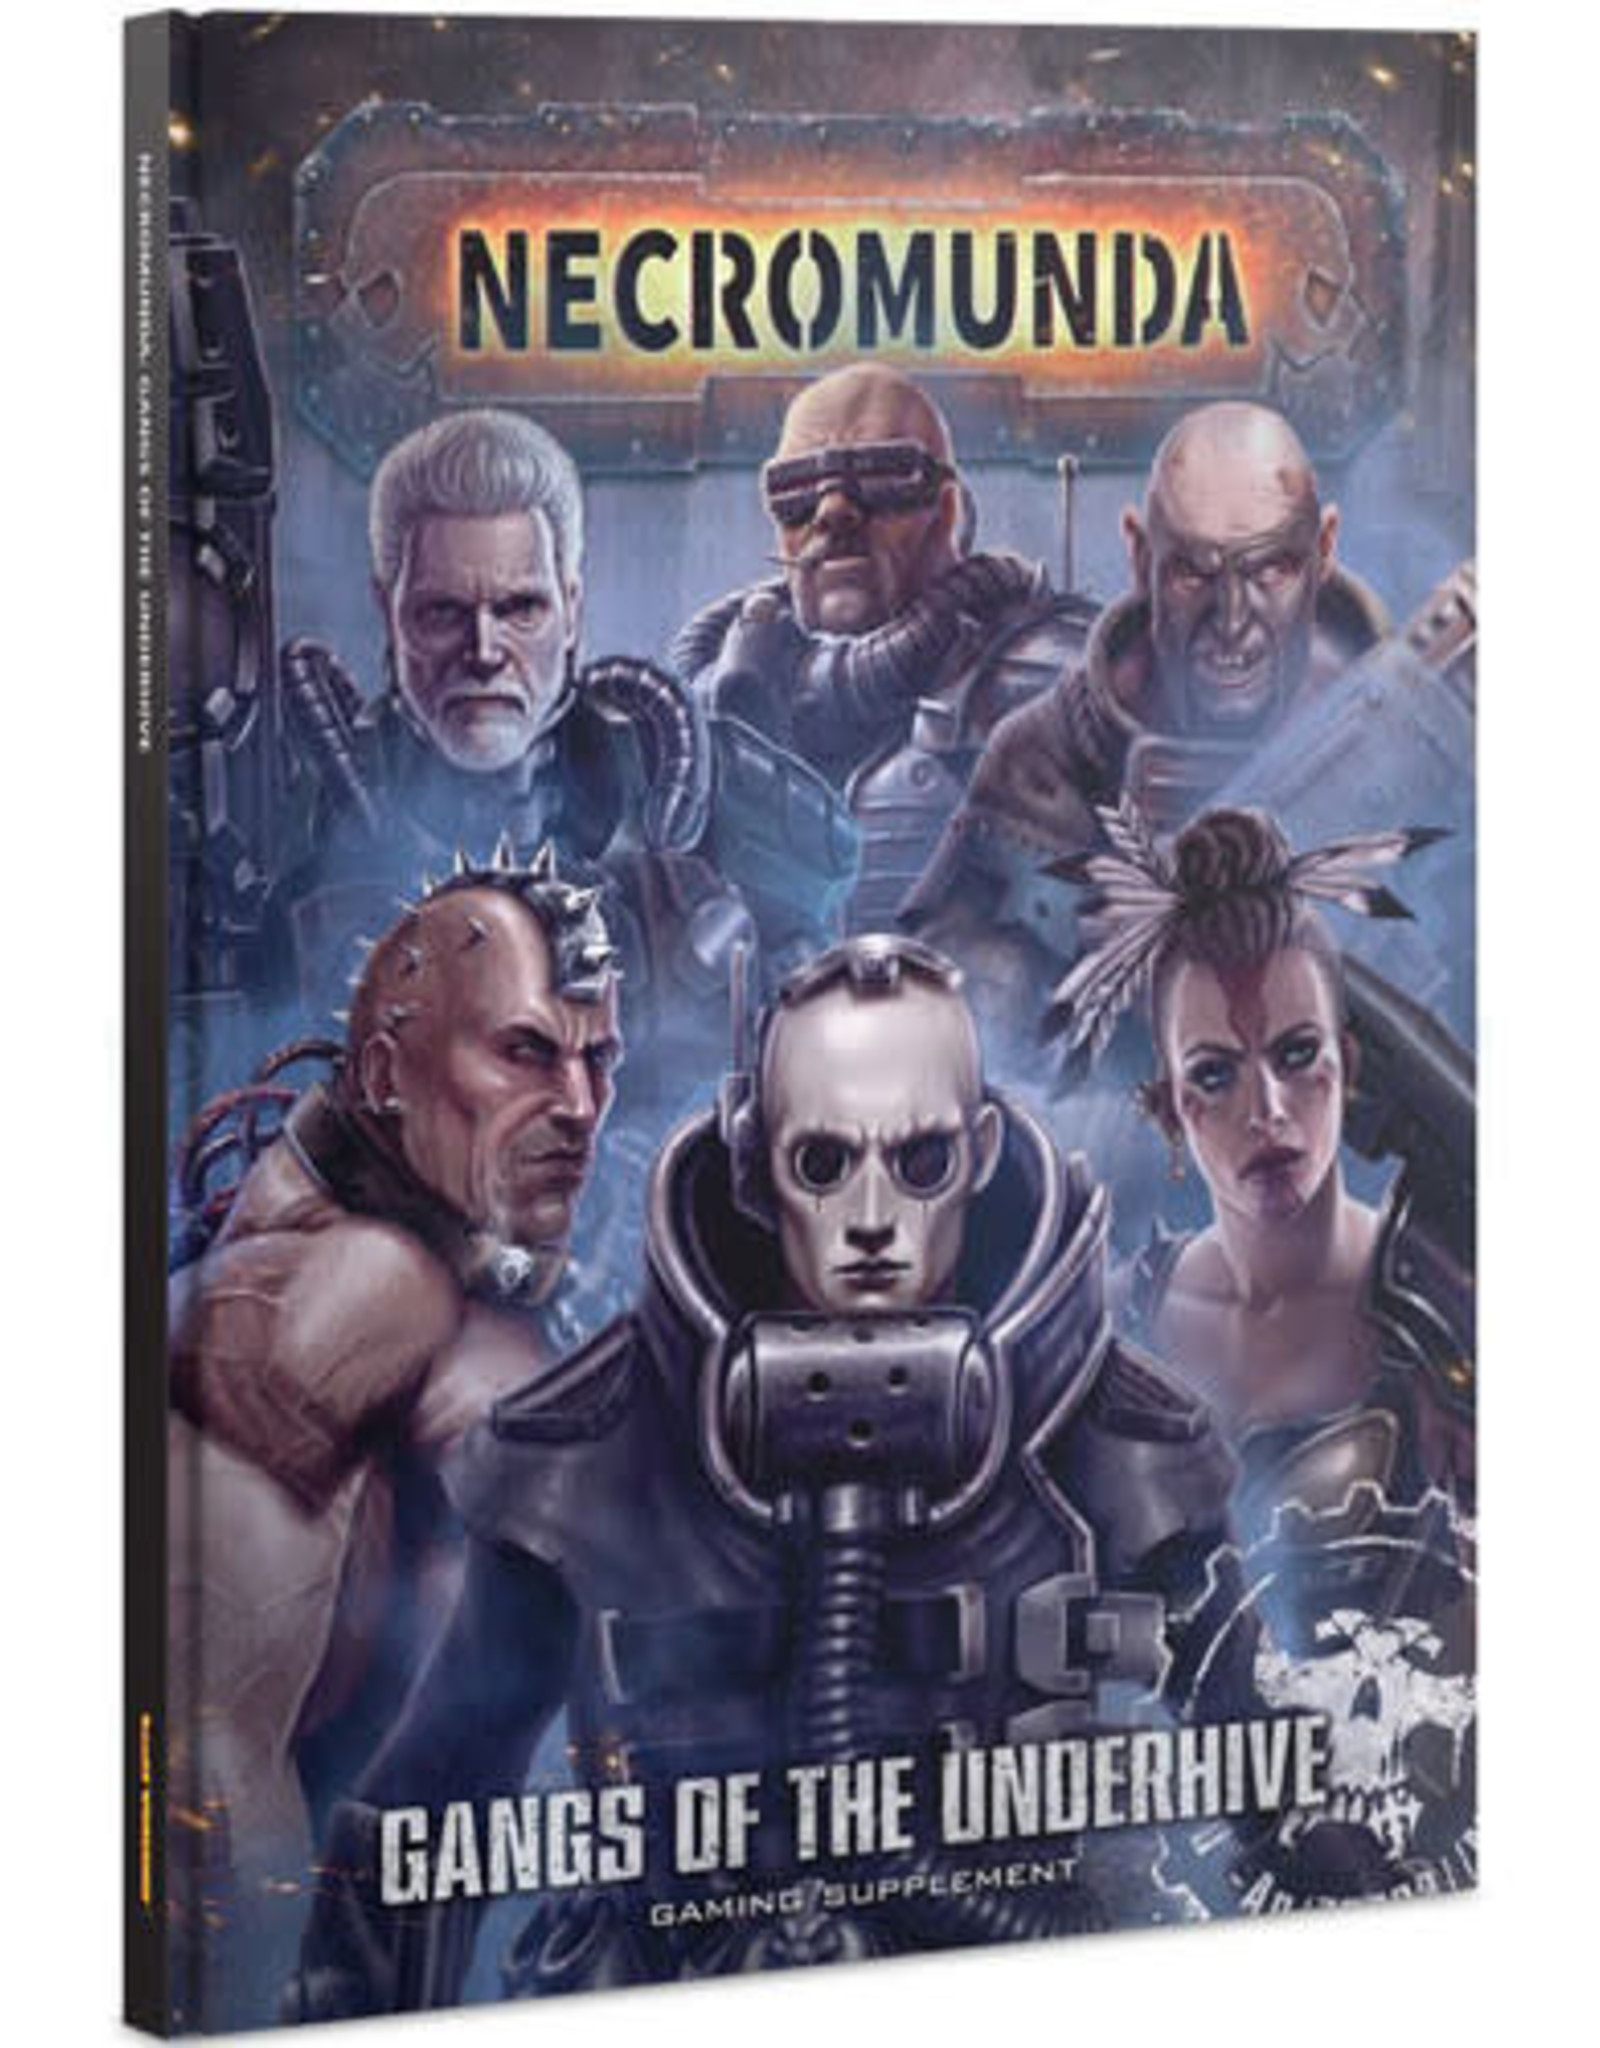 Necromunda Necromunda: Gangs Of The Underhive